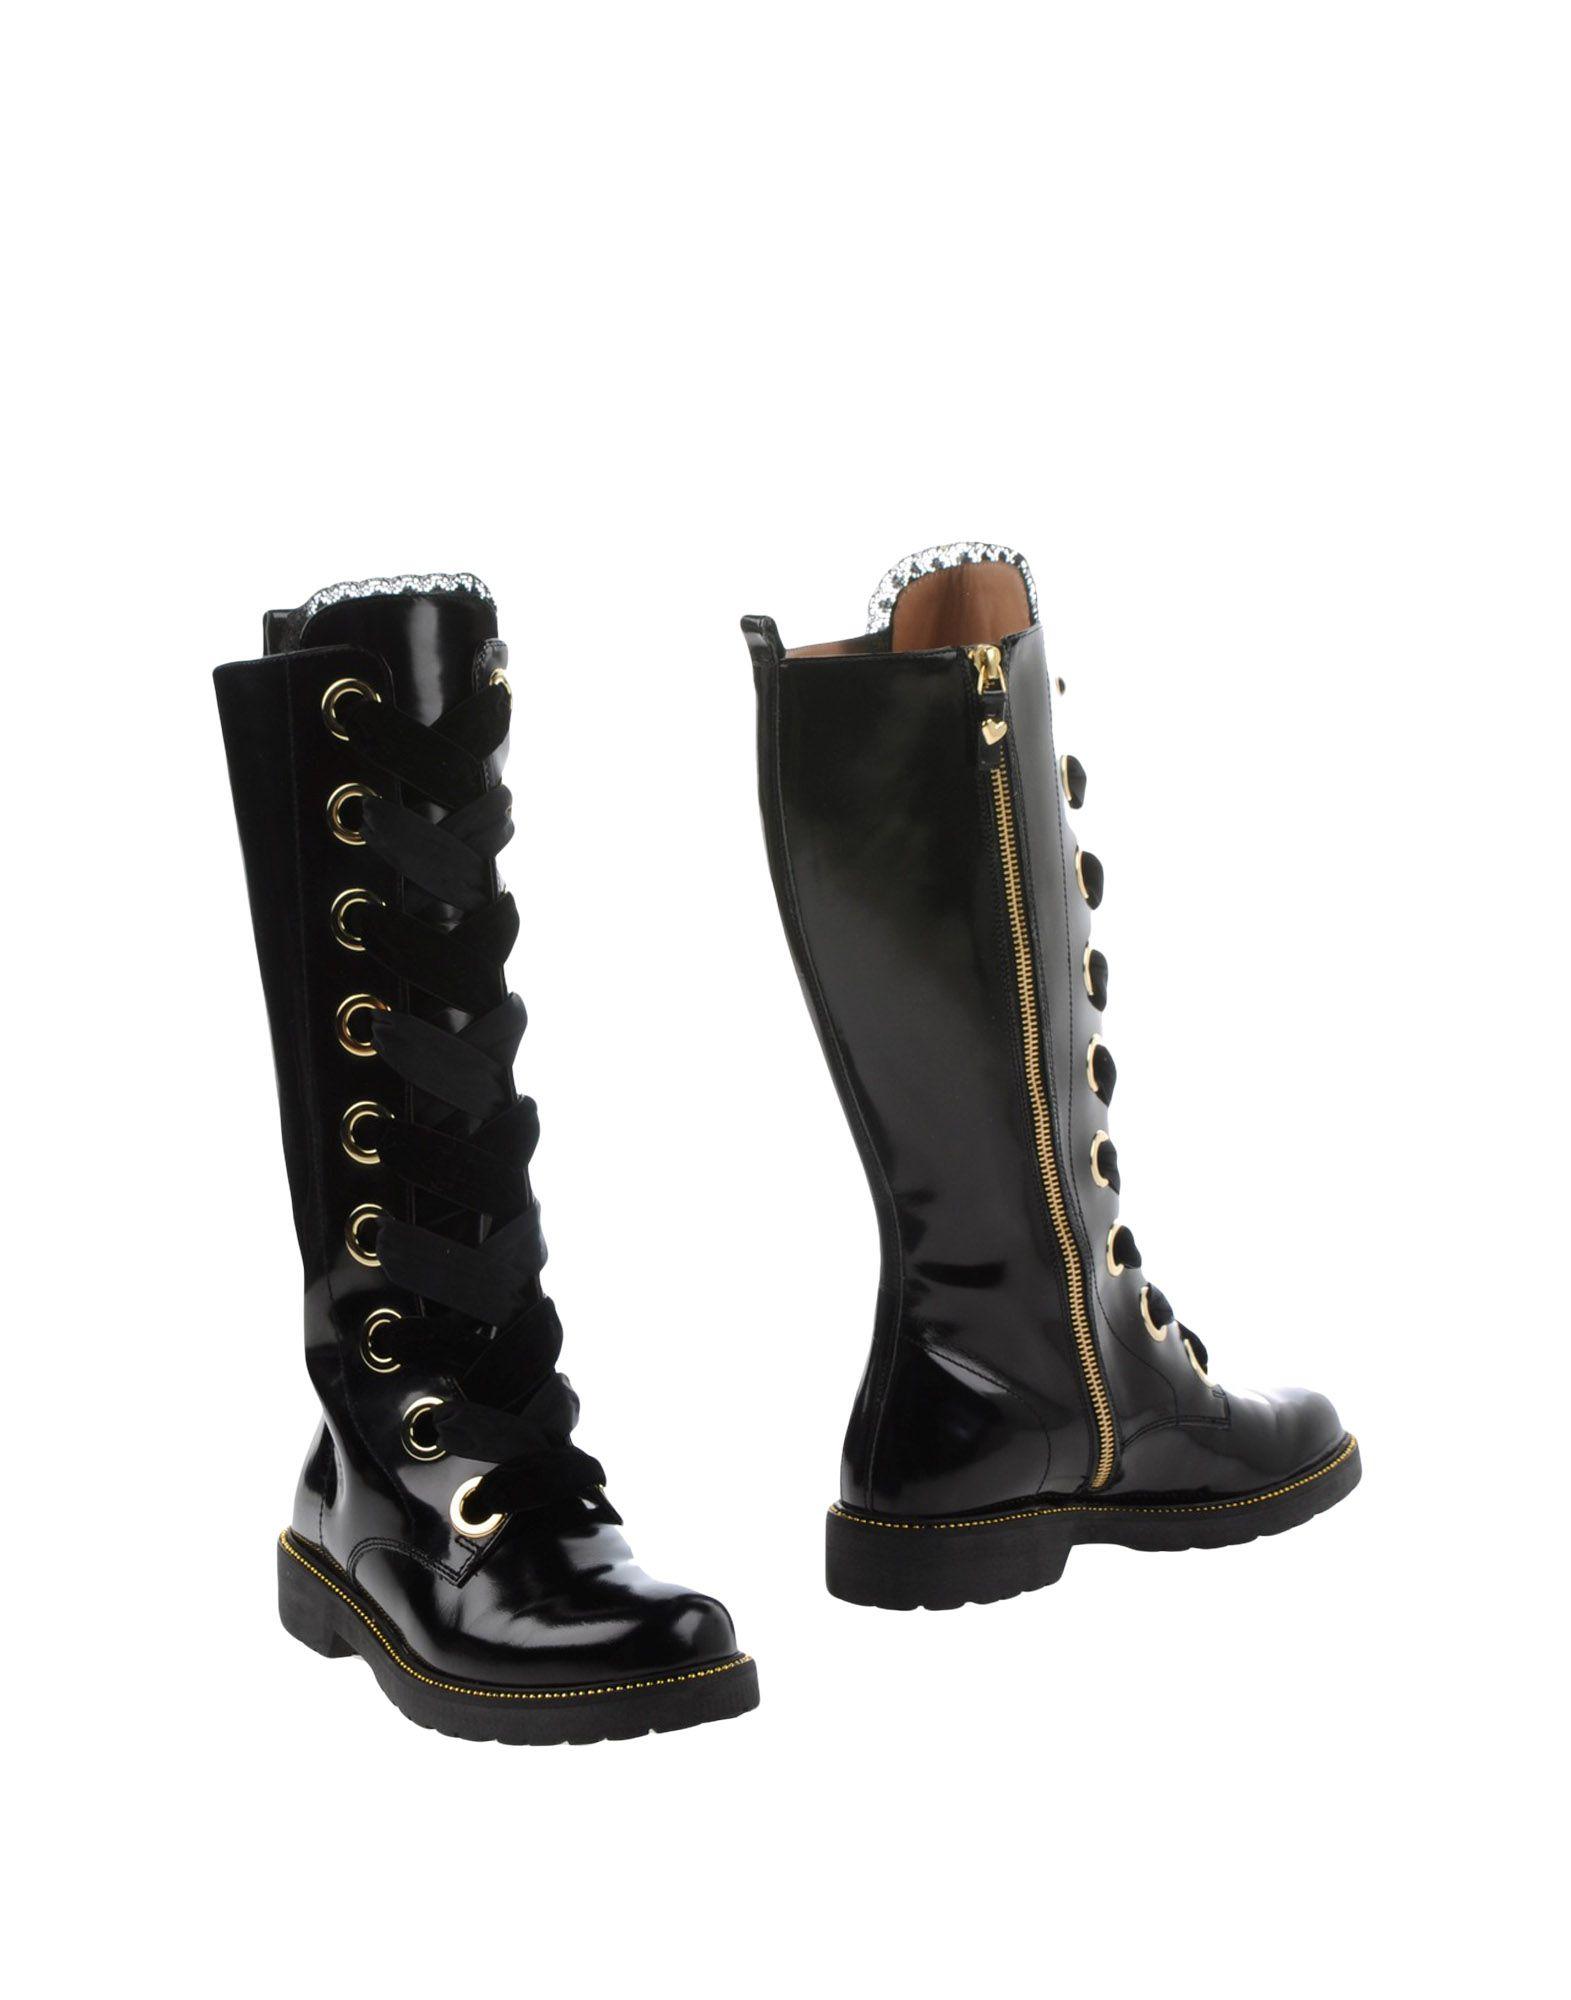 Haltbare Mode billige Schuhe Schuhe Twin 11215712SB Beliebte Schuhe billige e8856b